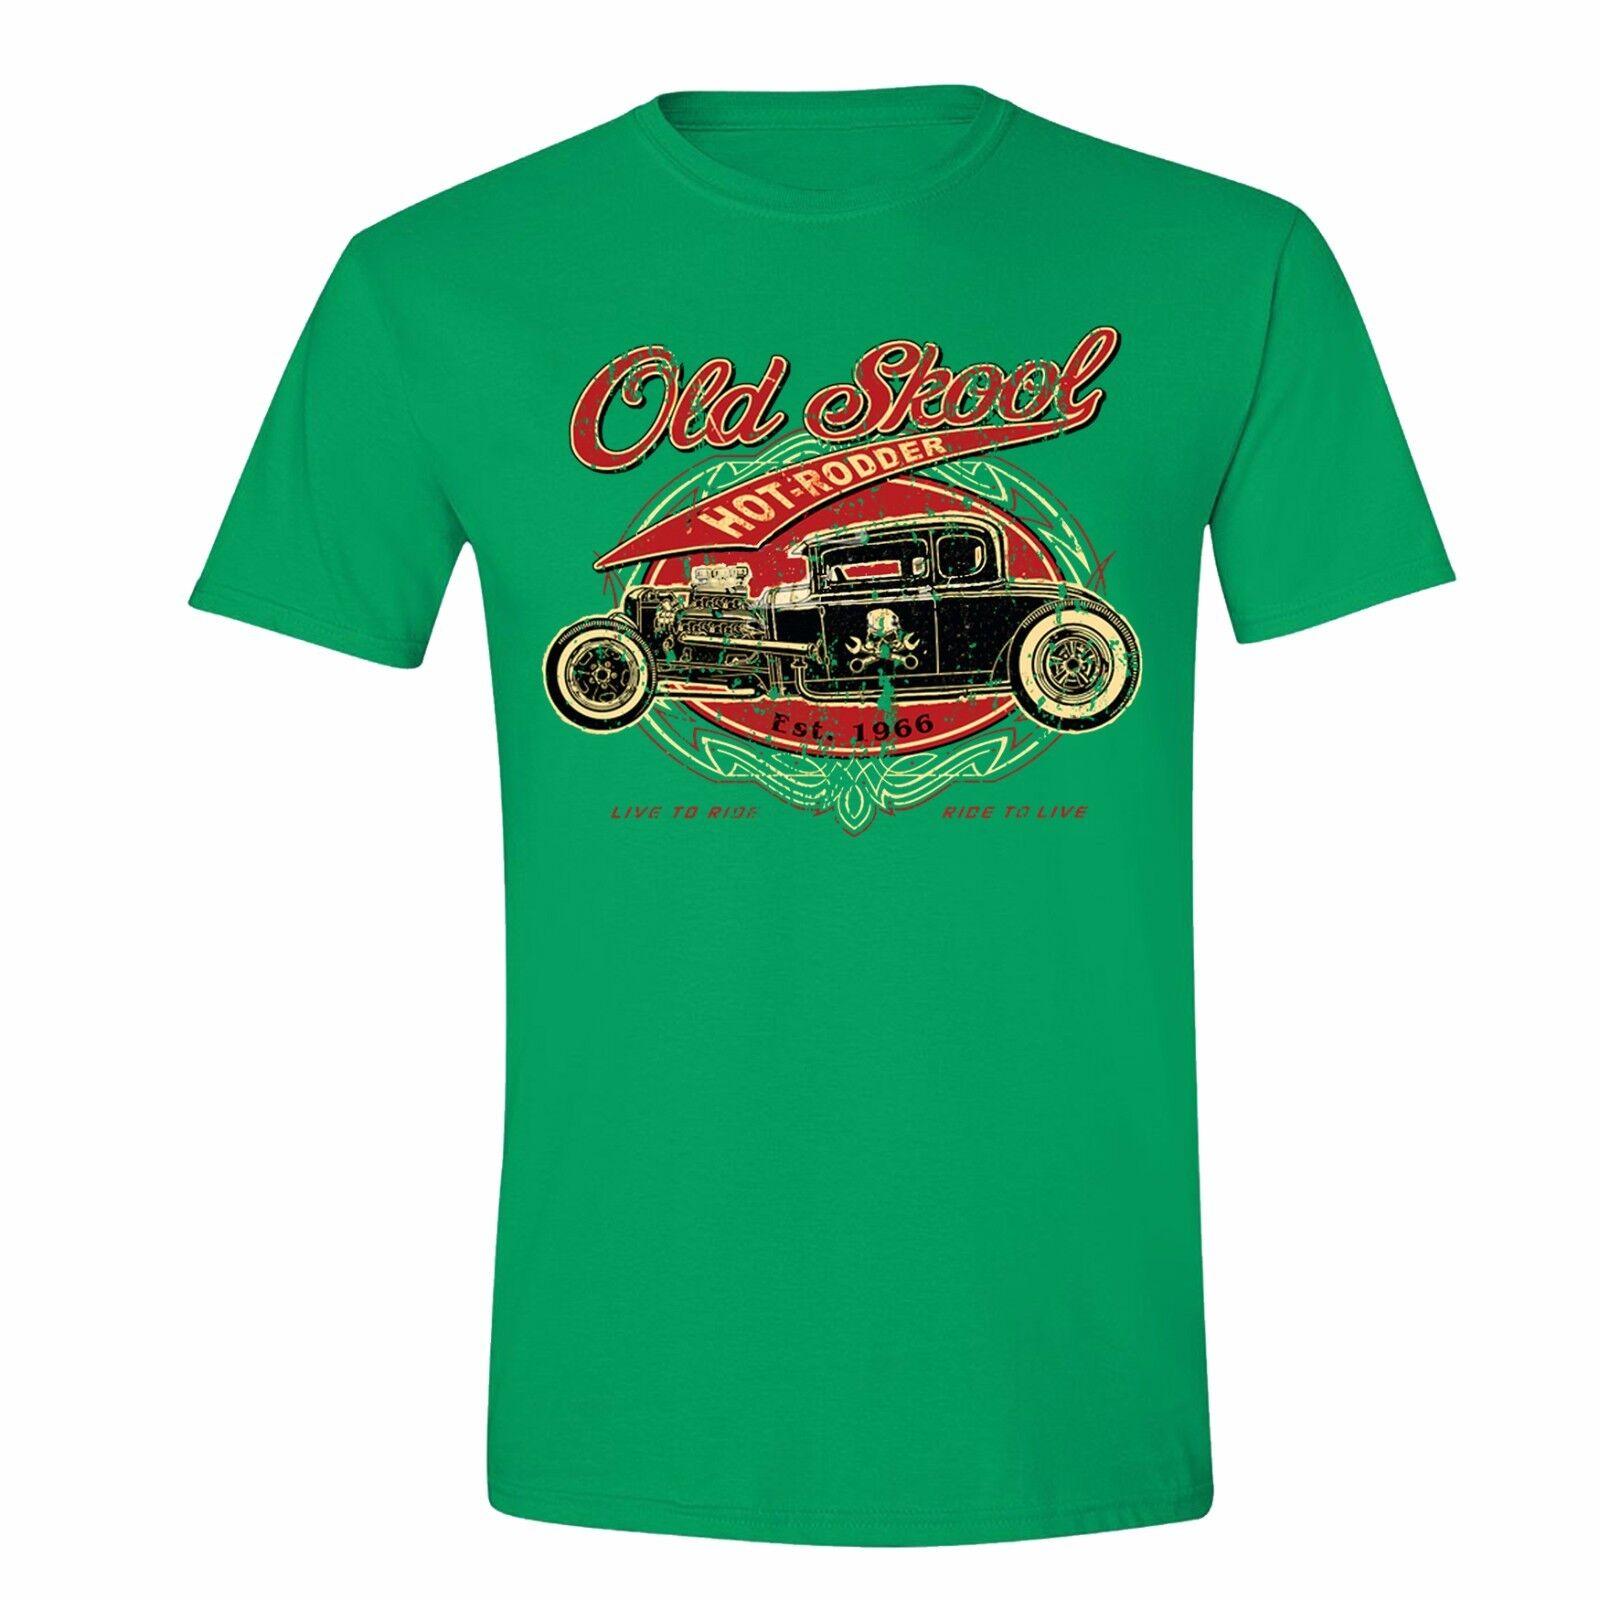 Old Skool school Tank Hot Roddder Shirt Vintage Car Hudson Flint Tank top Black